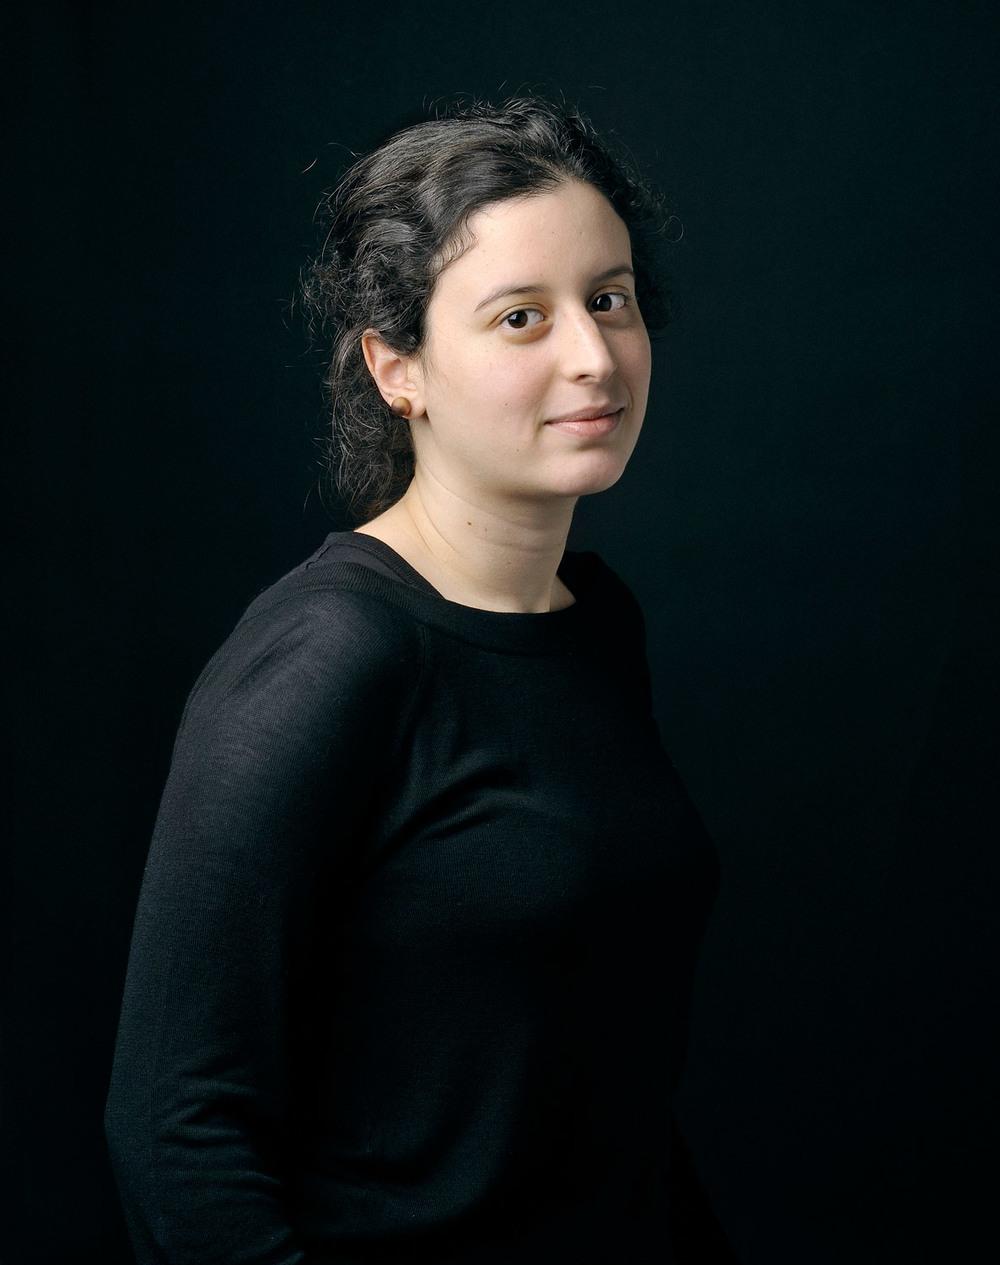 Fatma ben Amor, originaire d'Algérie